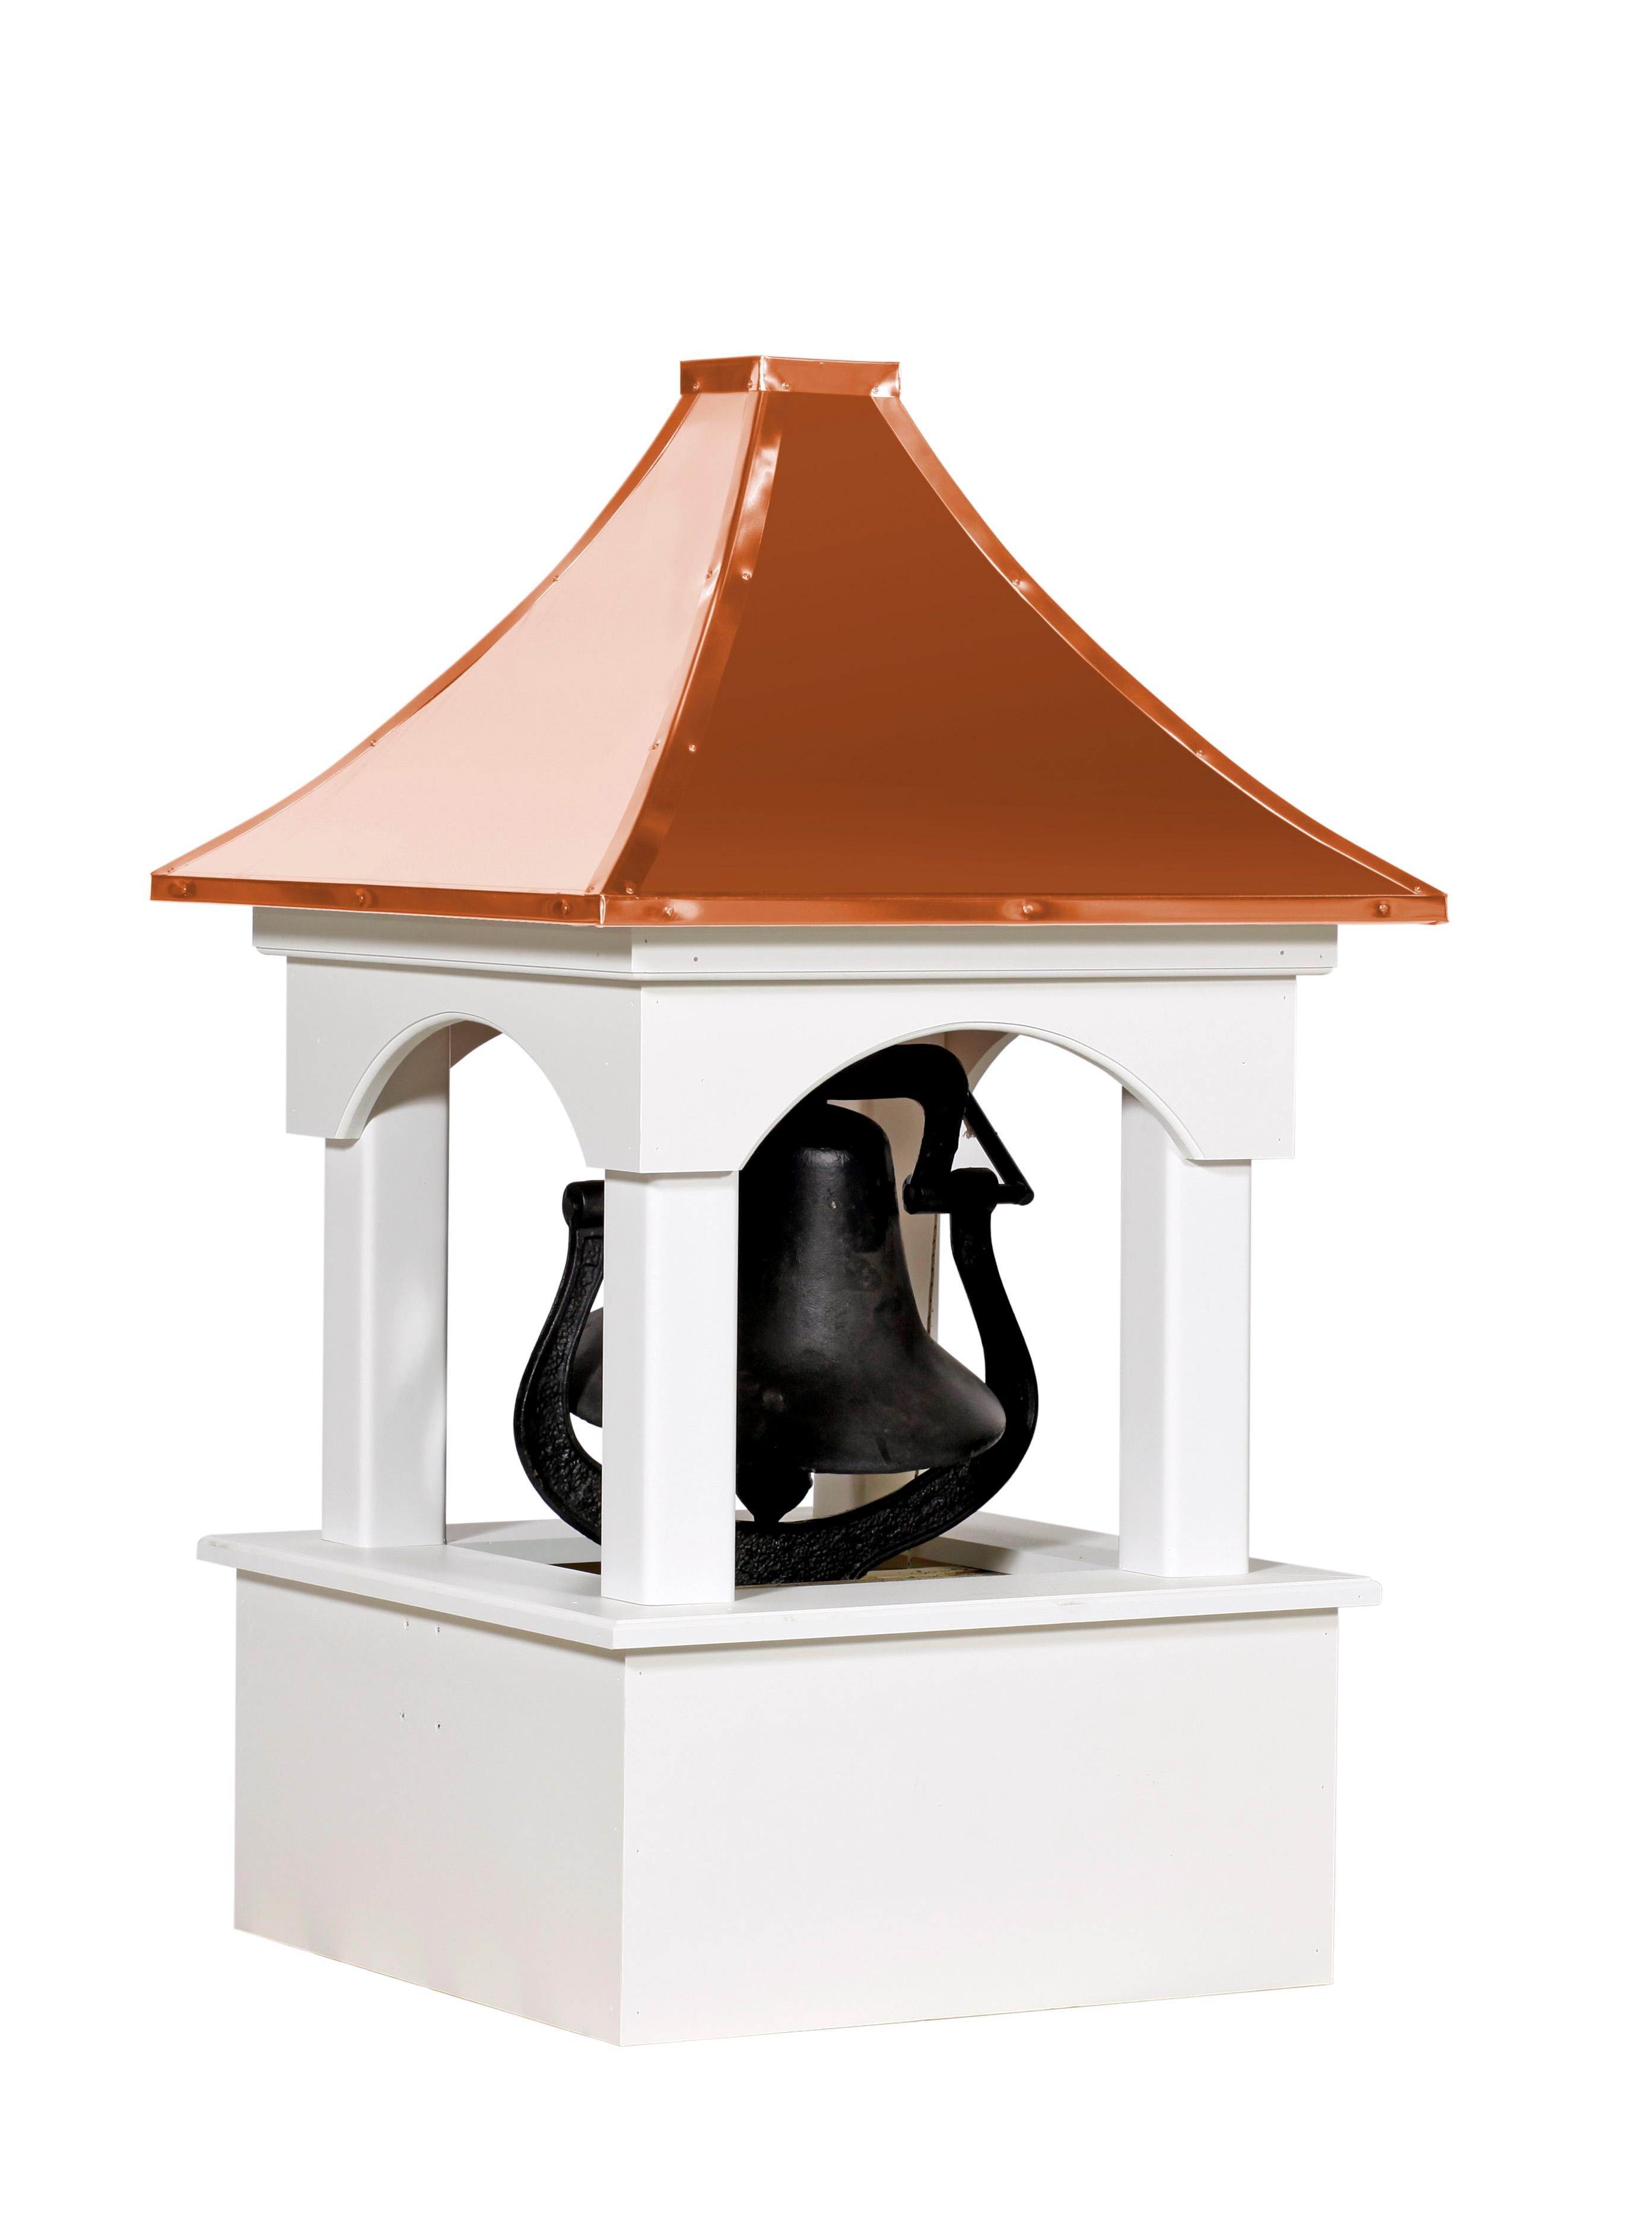 BELL TOWER DESIGNER CUPOLAS (S7BV)